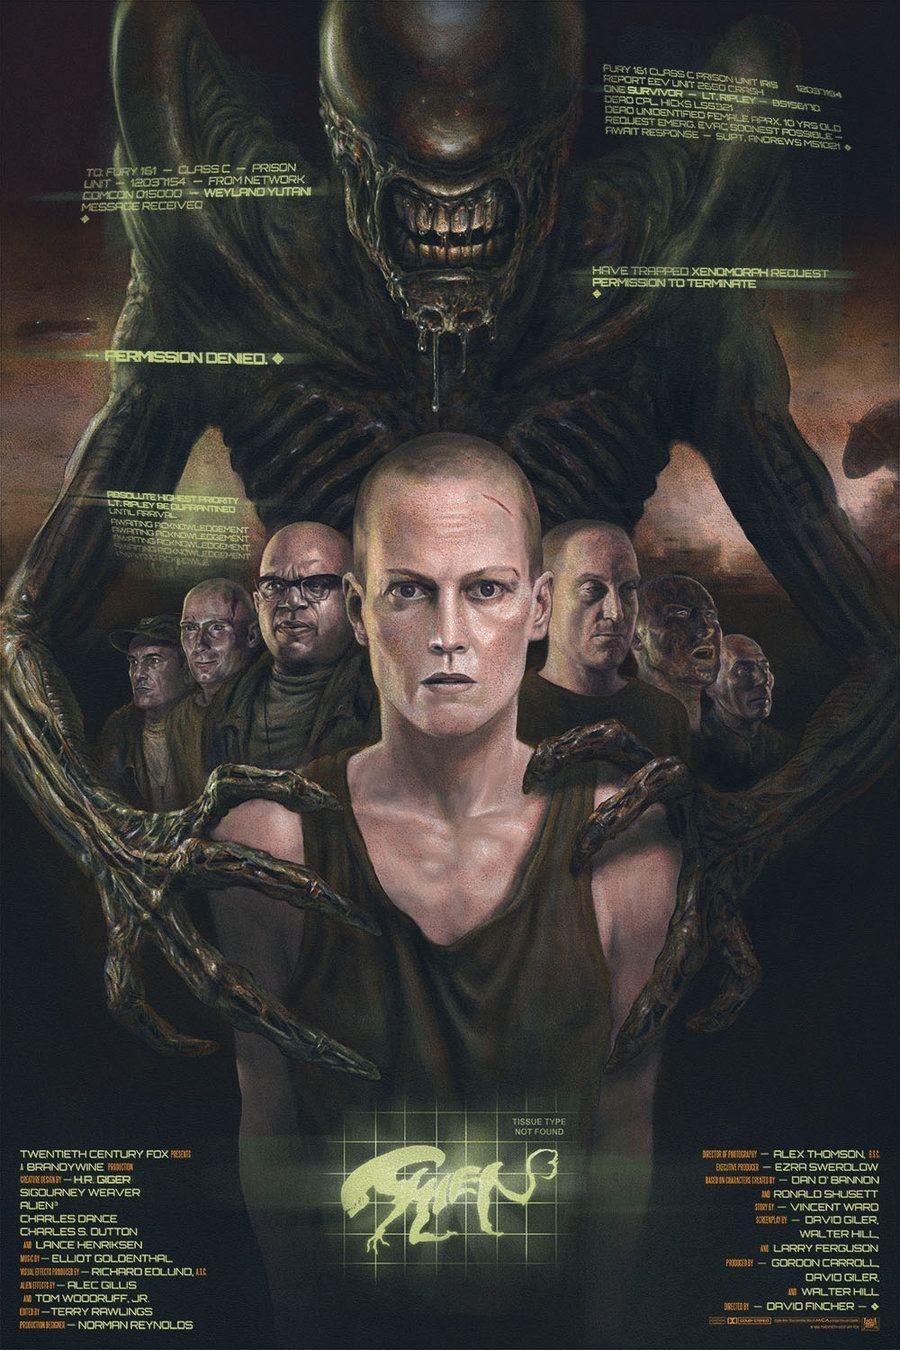 Alien 3 By John Barry Ballaran Alternative Movie Posters Aliens Movie Movie Posters